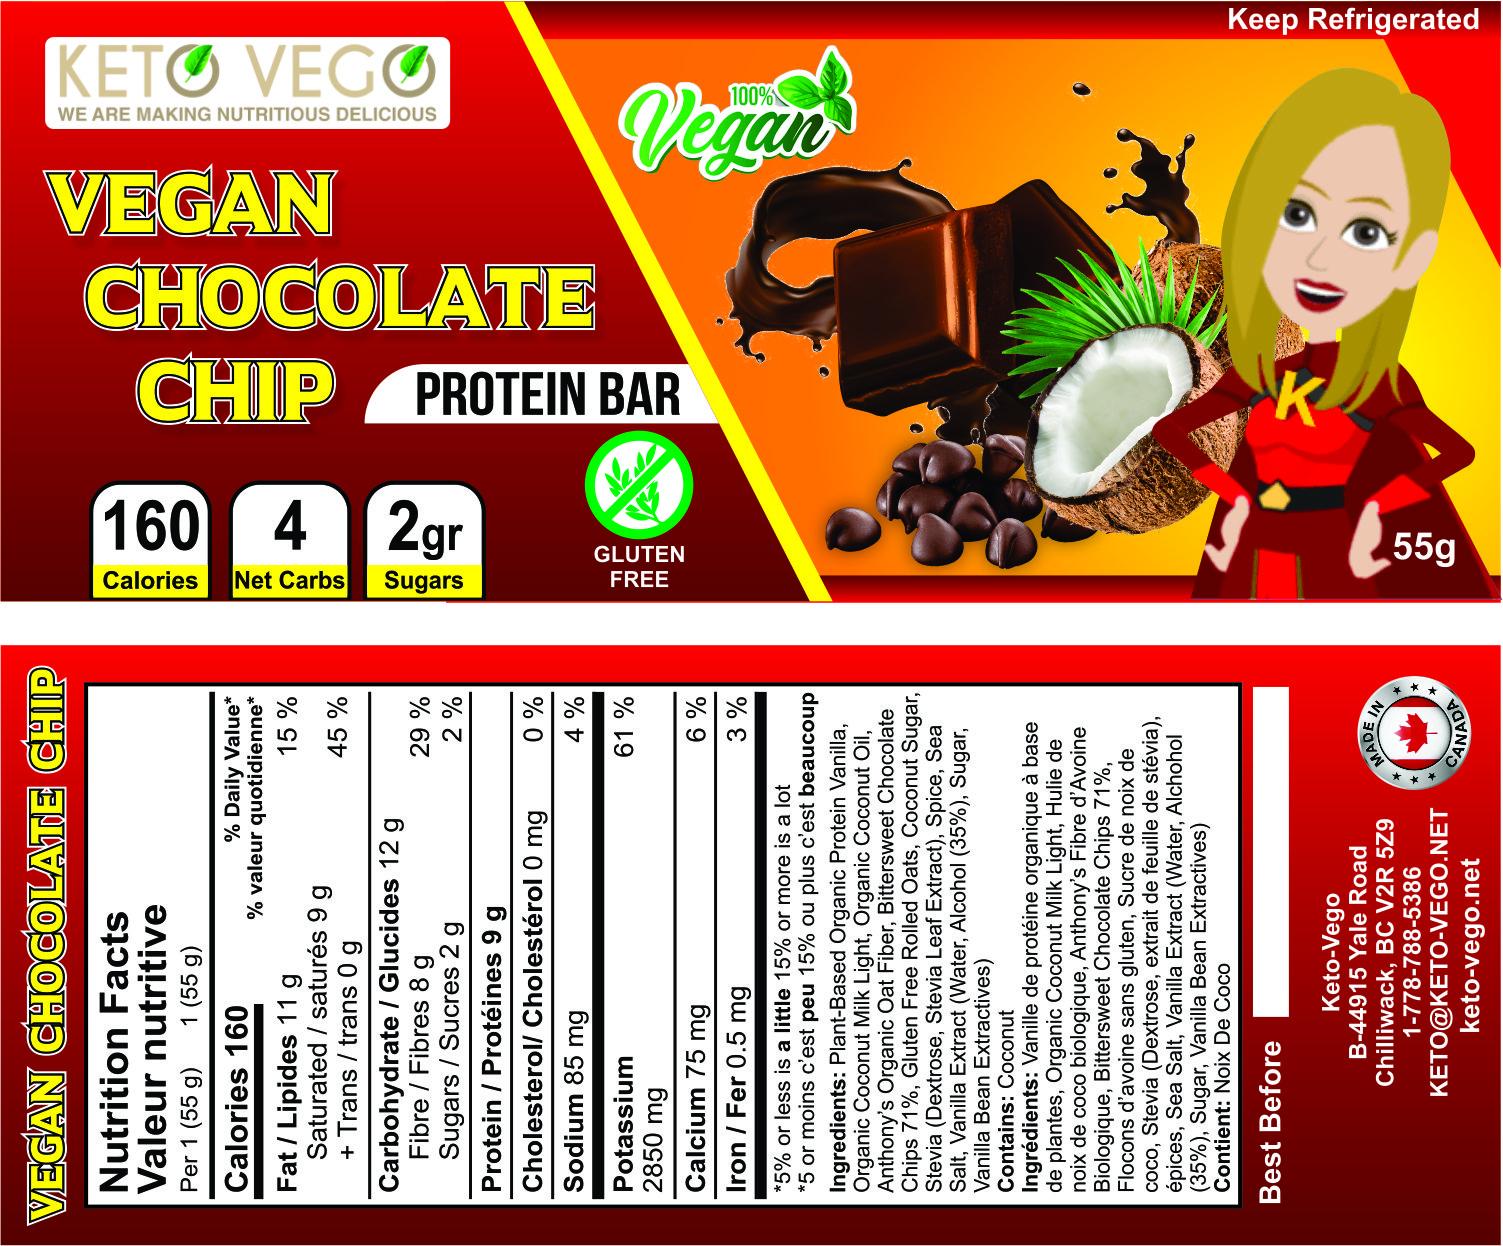 Keto Vego - Vegan Chocolate Chip